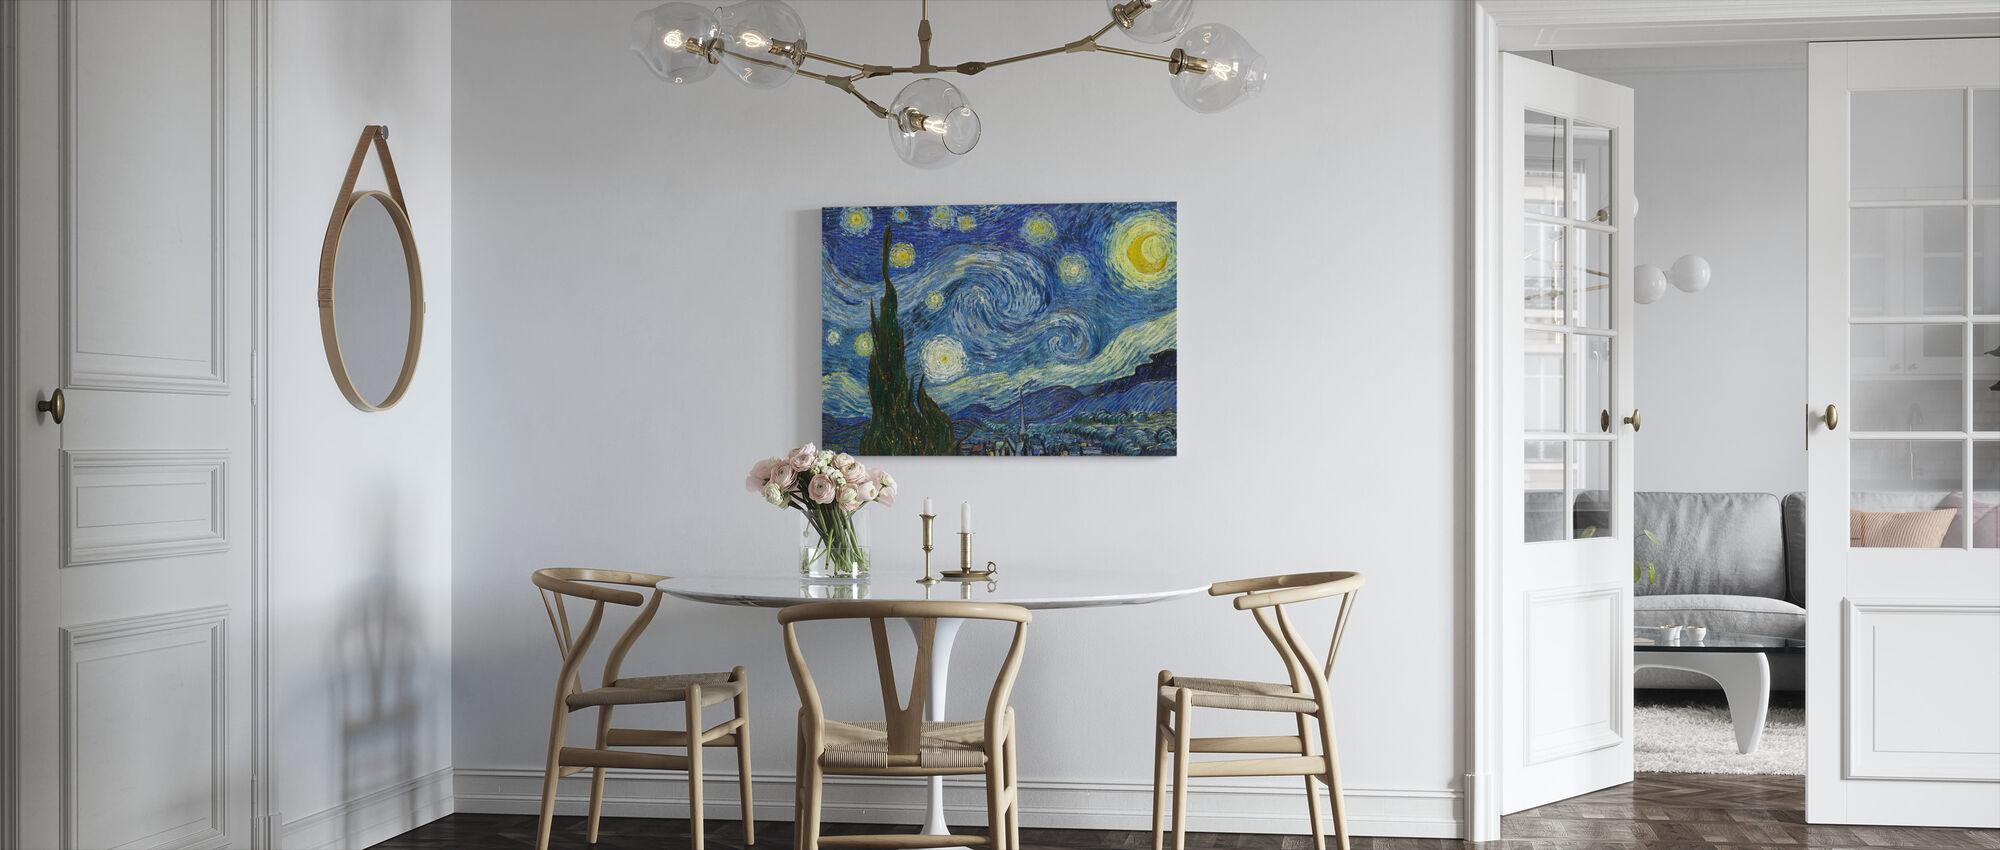 Vincent Van Gogh - Starry Night - Canvastaulu - Keittiö